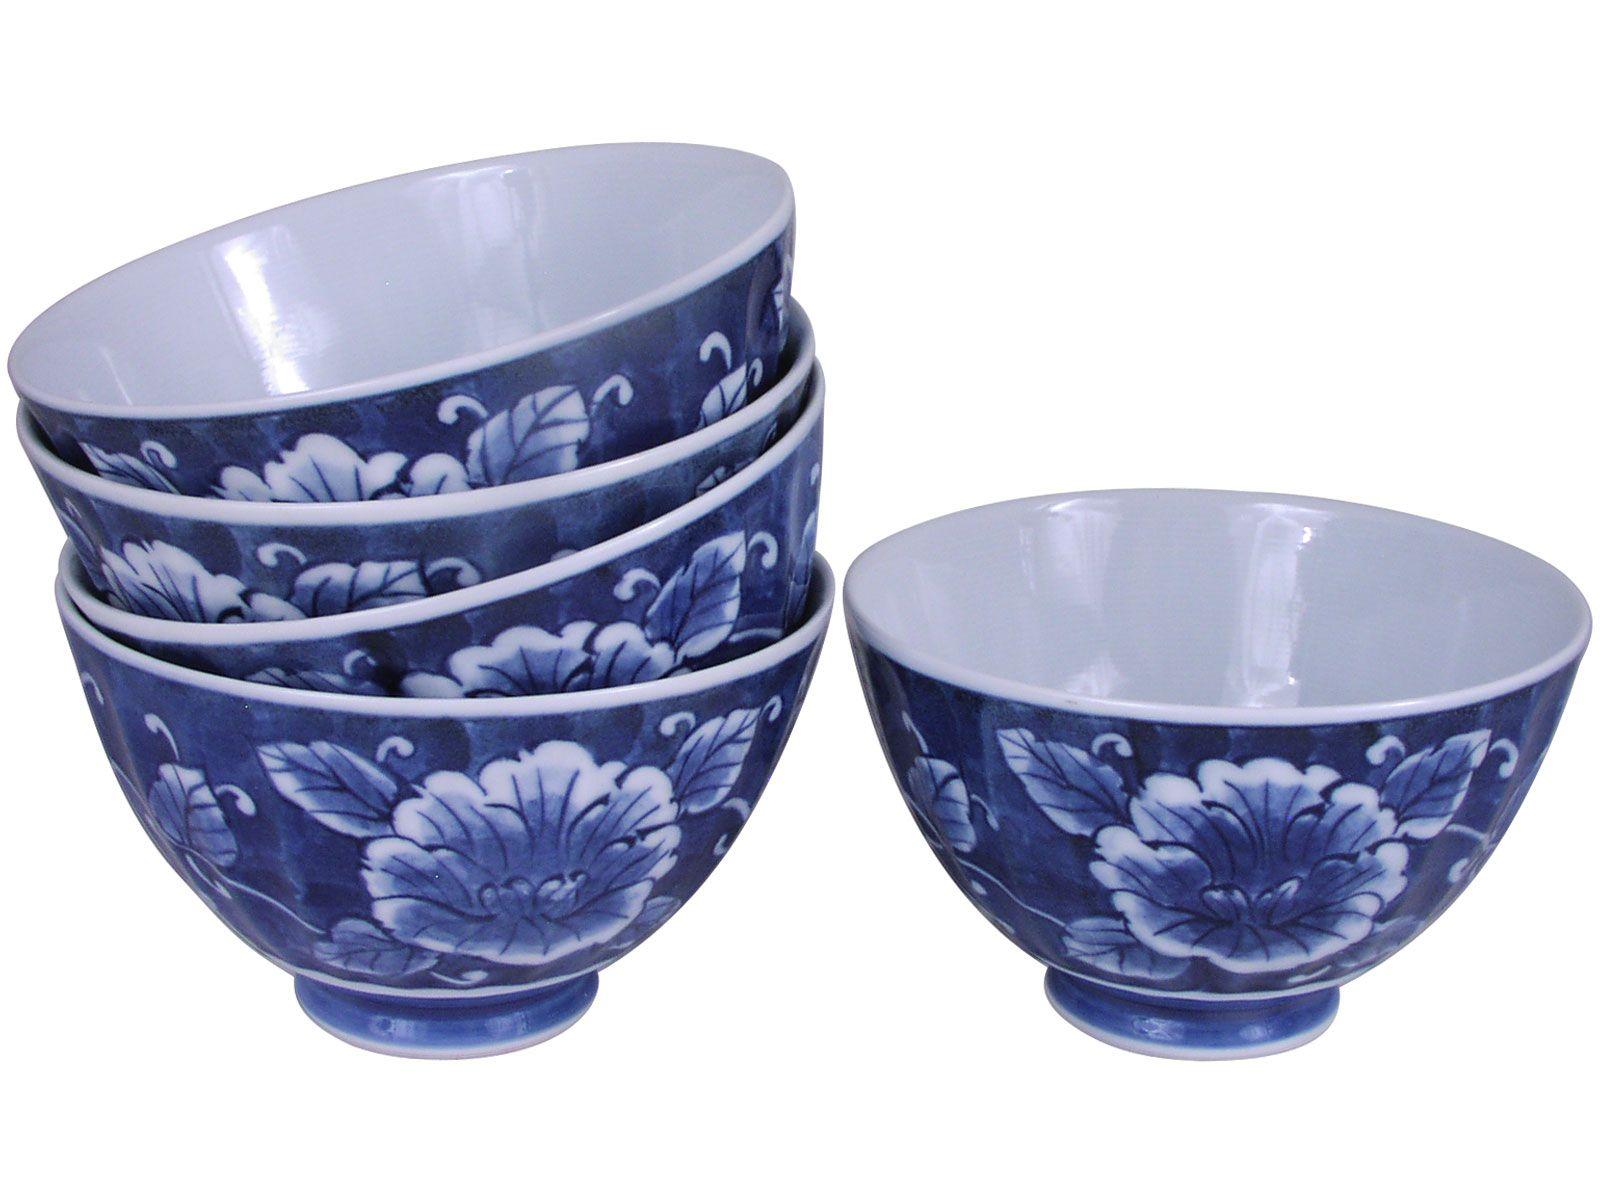 Crowning Peony Porcelain Rice Bowl Set For Five Japanese Rice Bowl Bowl Bowl Set